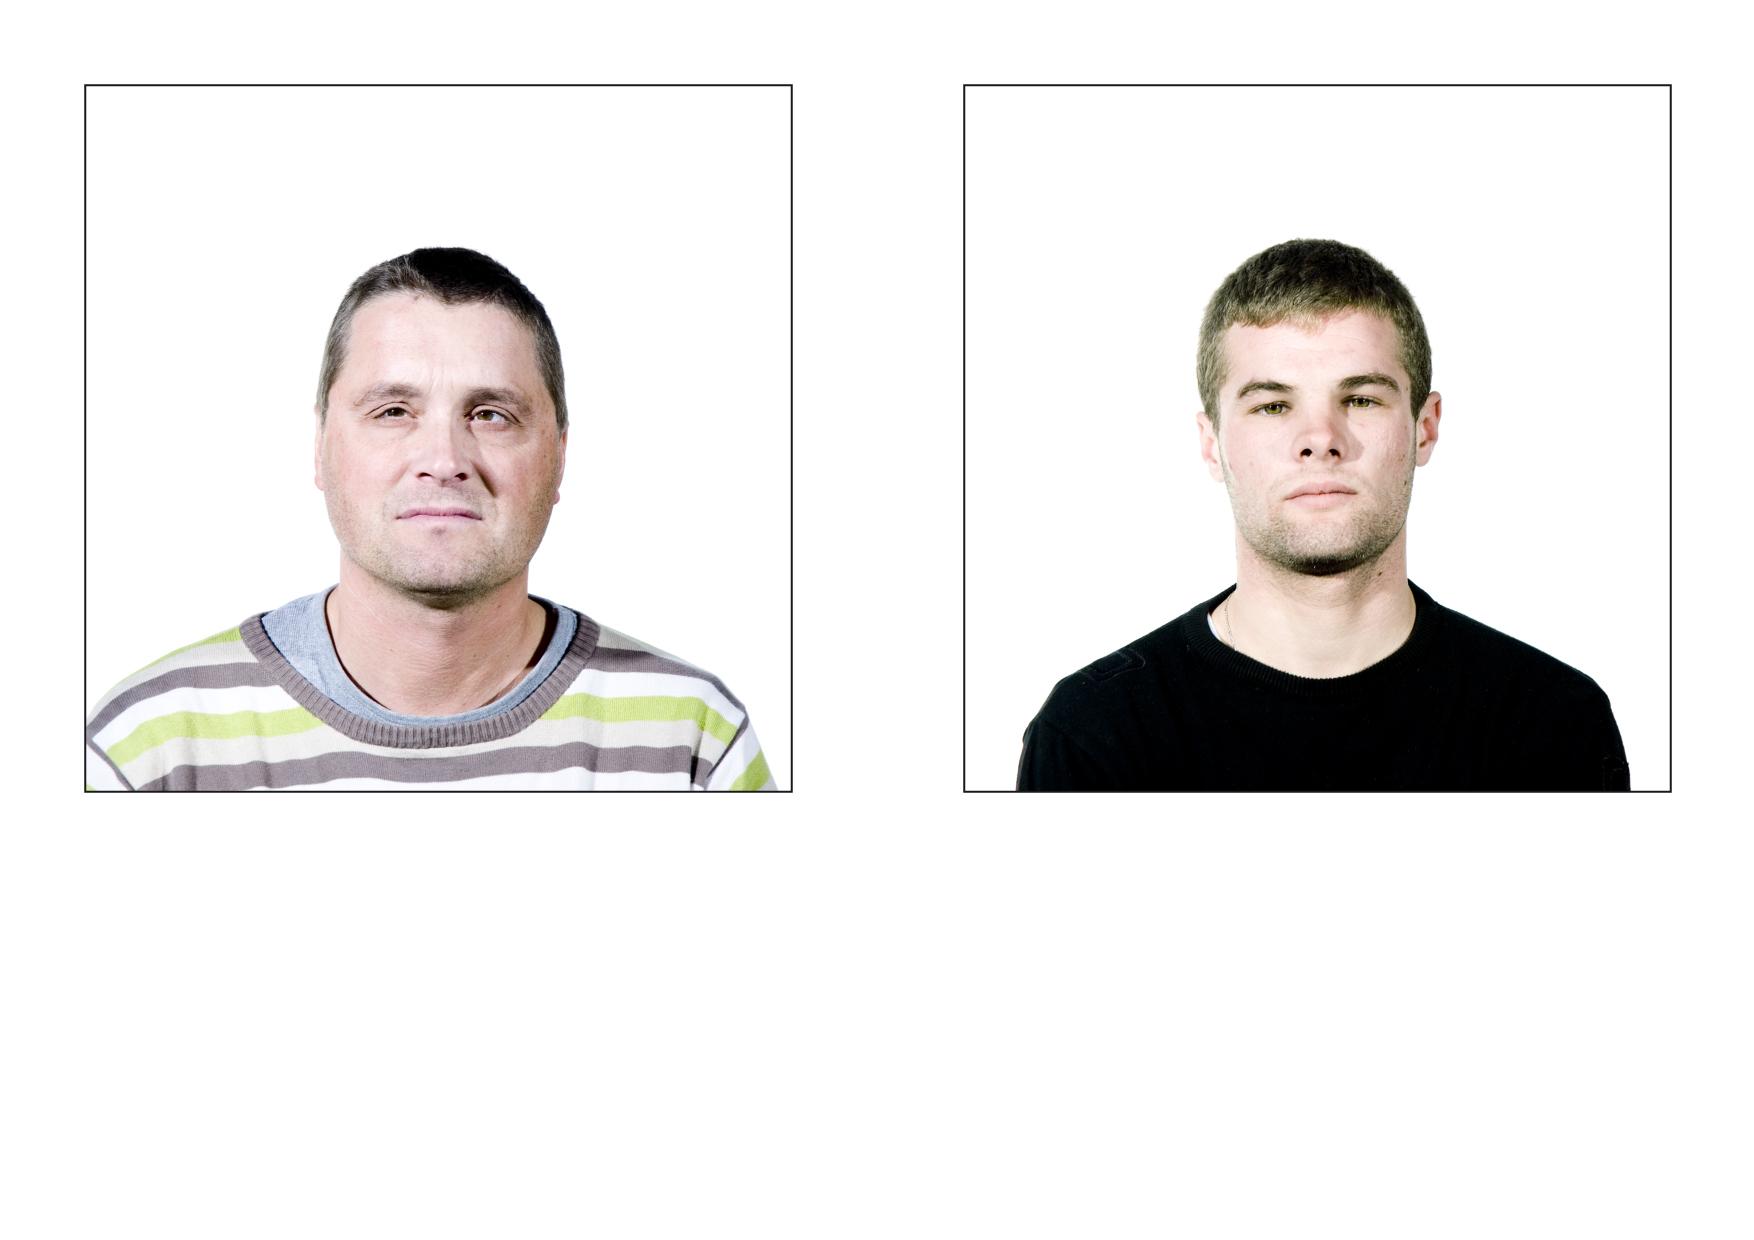 portraits-2-p2-3.jpg